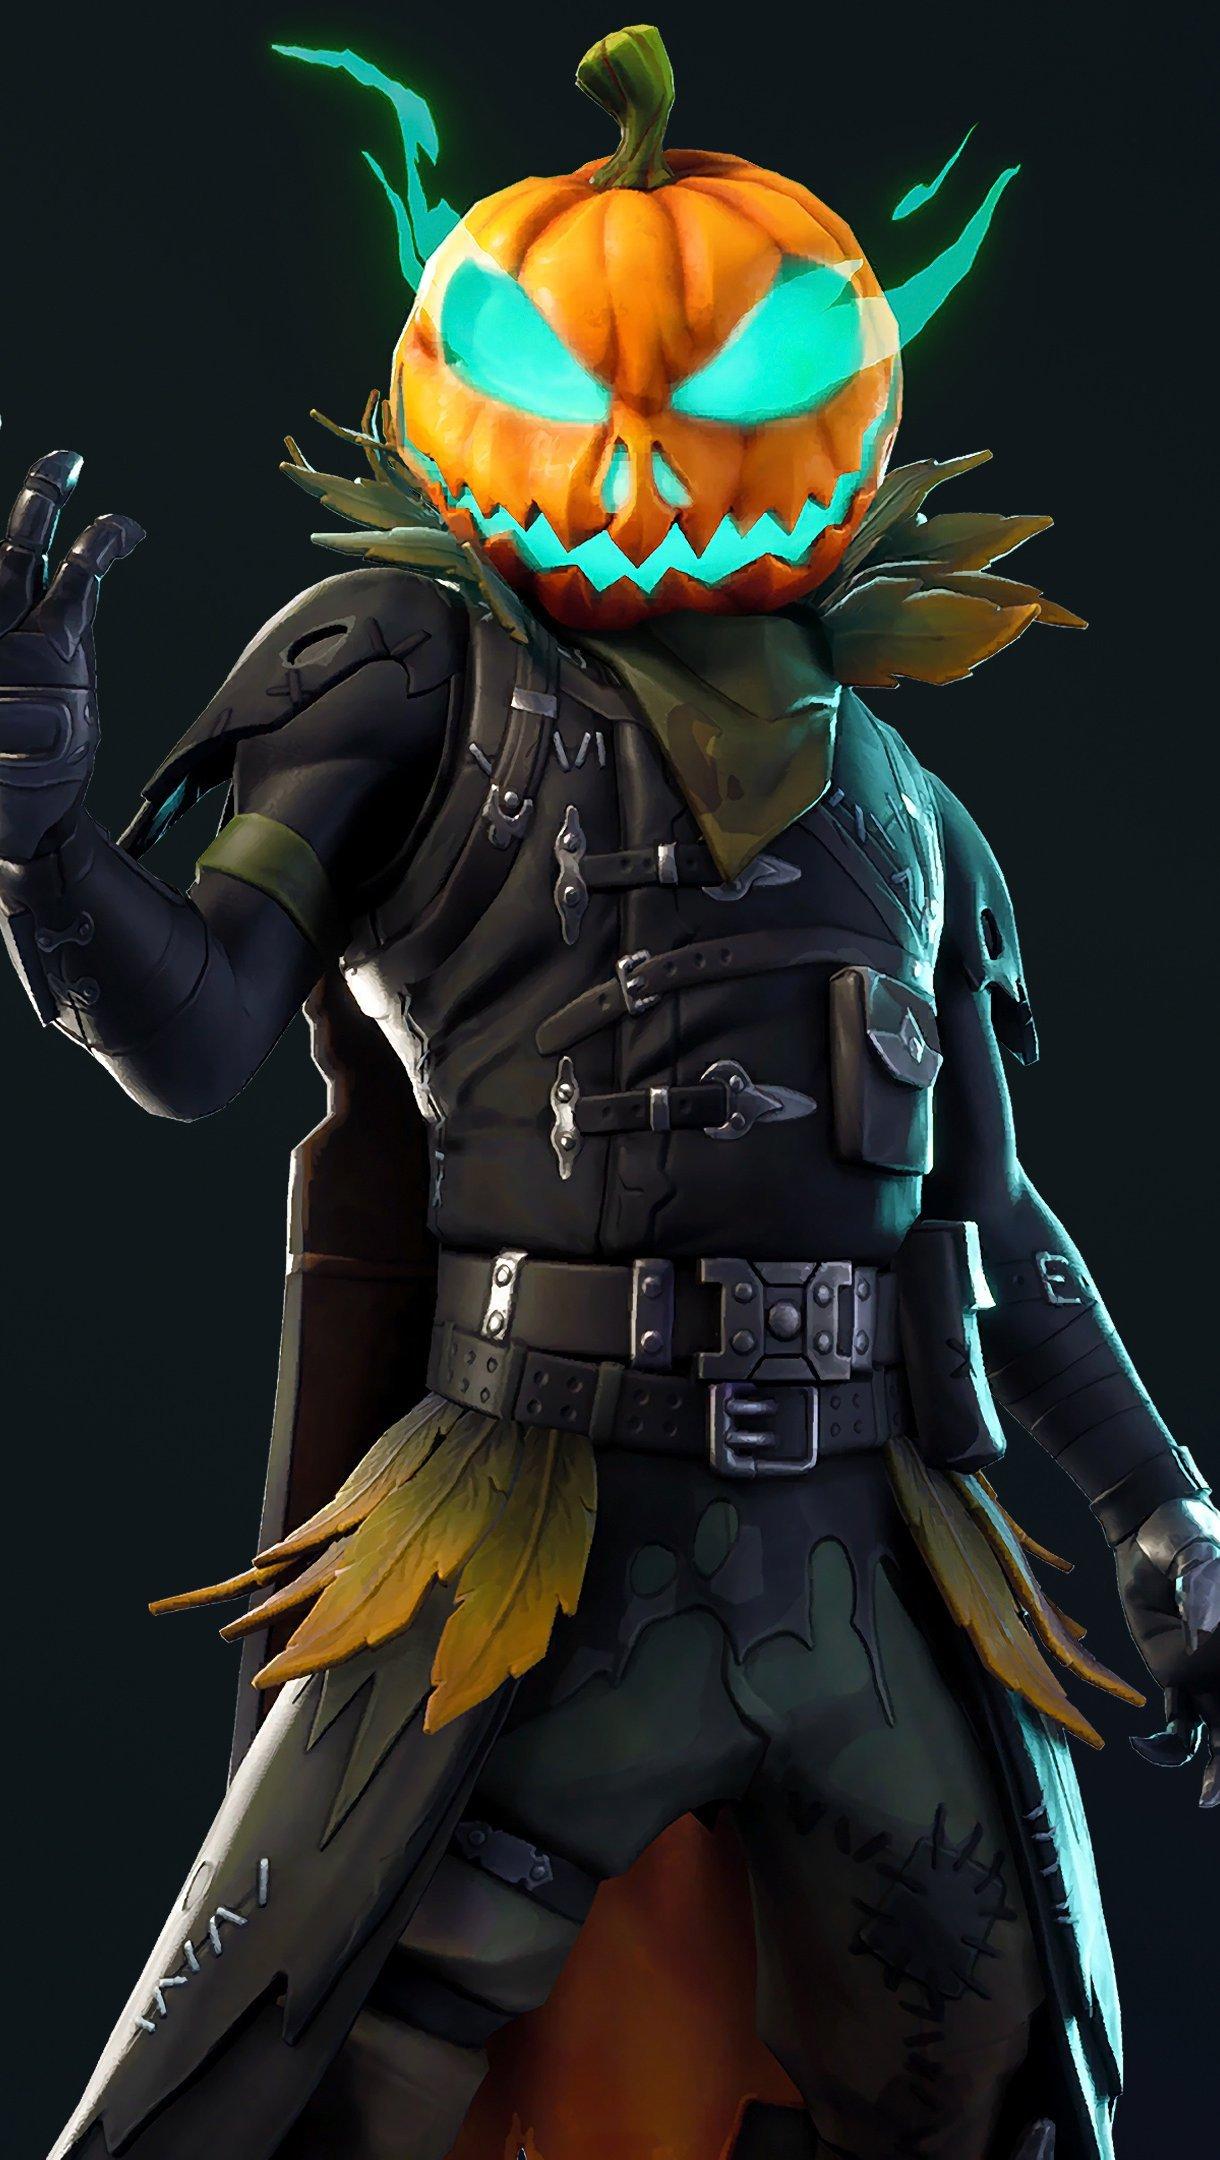 Fondos de pantalla Fortnite Battle Royale Halloween Vertical